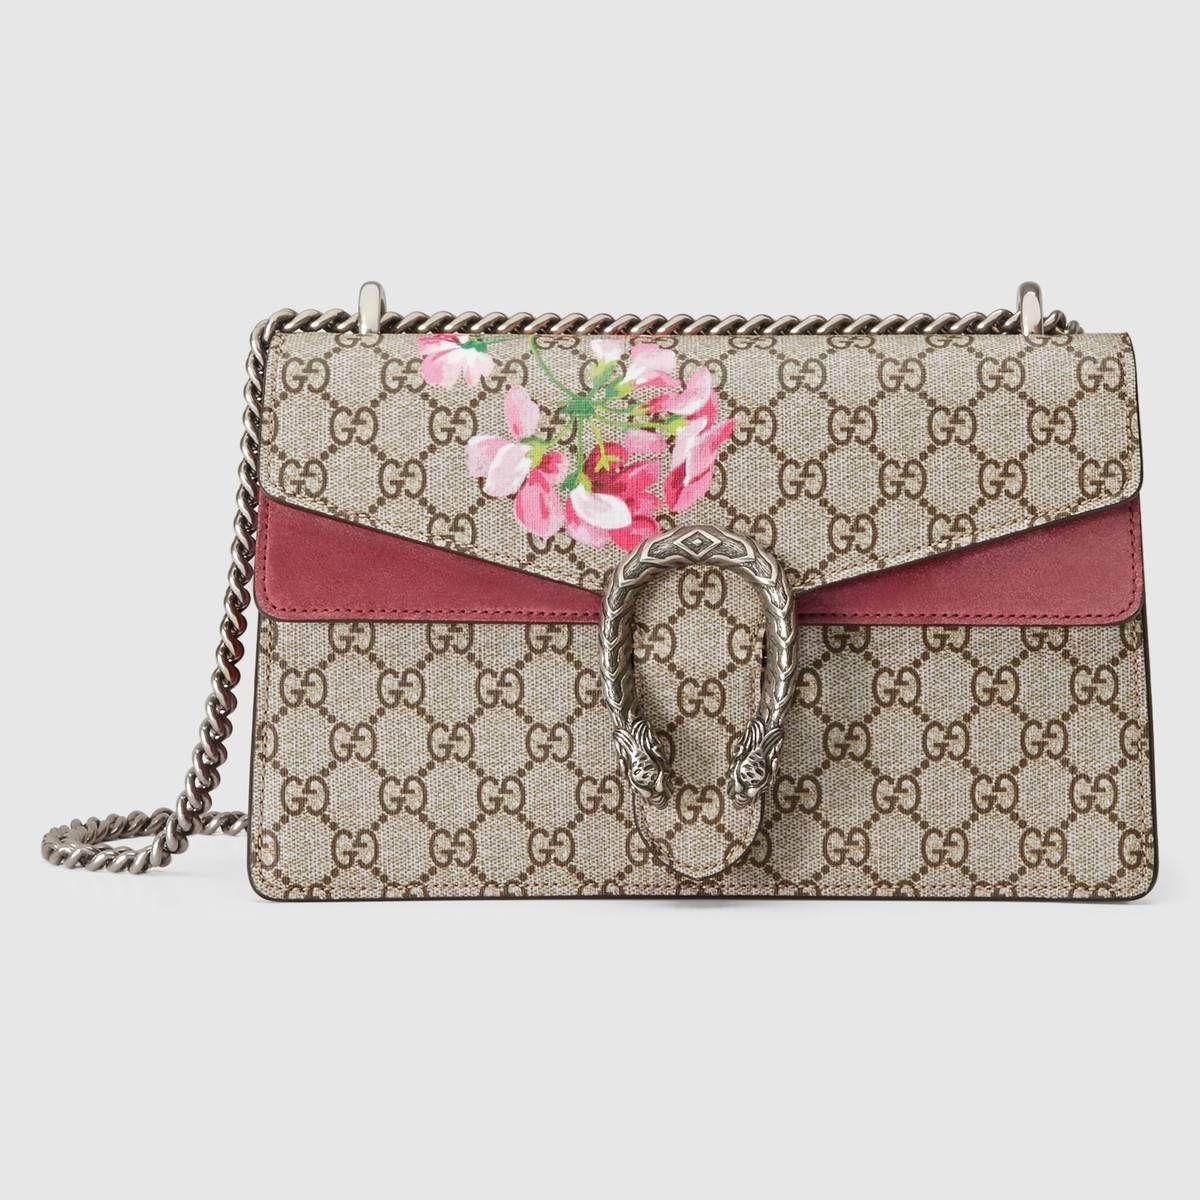 Gucci Dionysus Small Gg Blooms Shoulder Bag Gucci Shoulder Bag Shoulder Bag Women Shoulder Bag